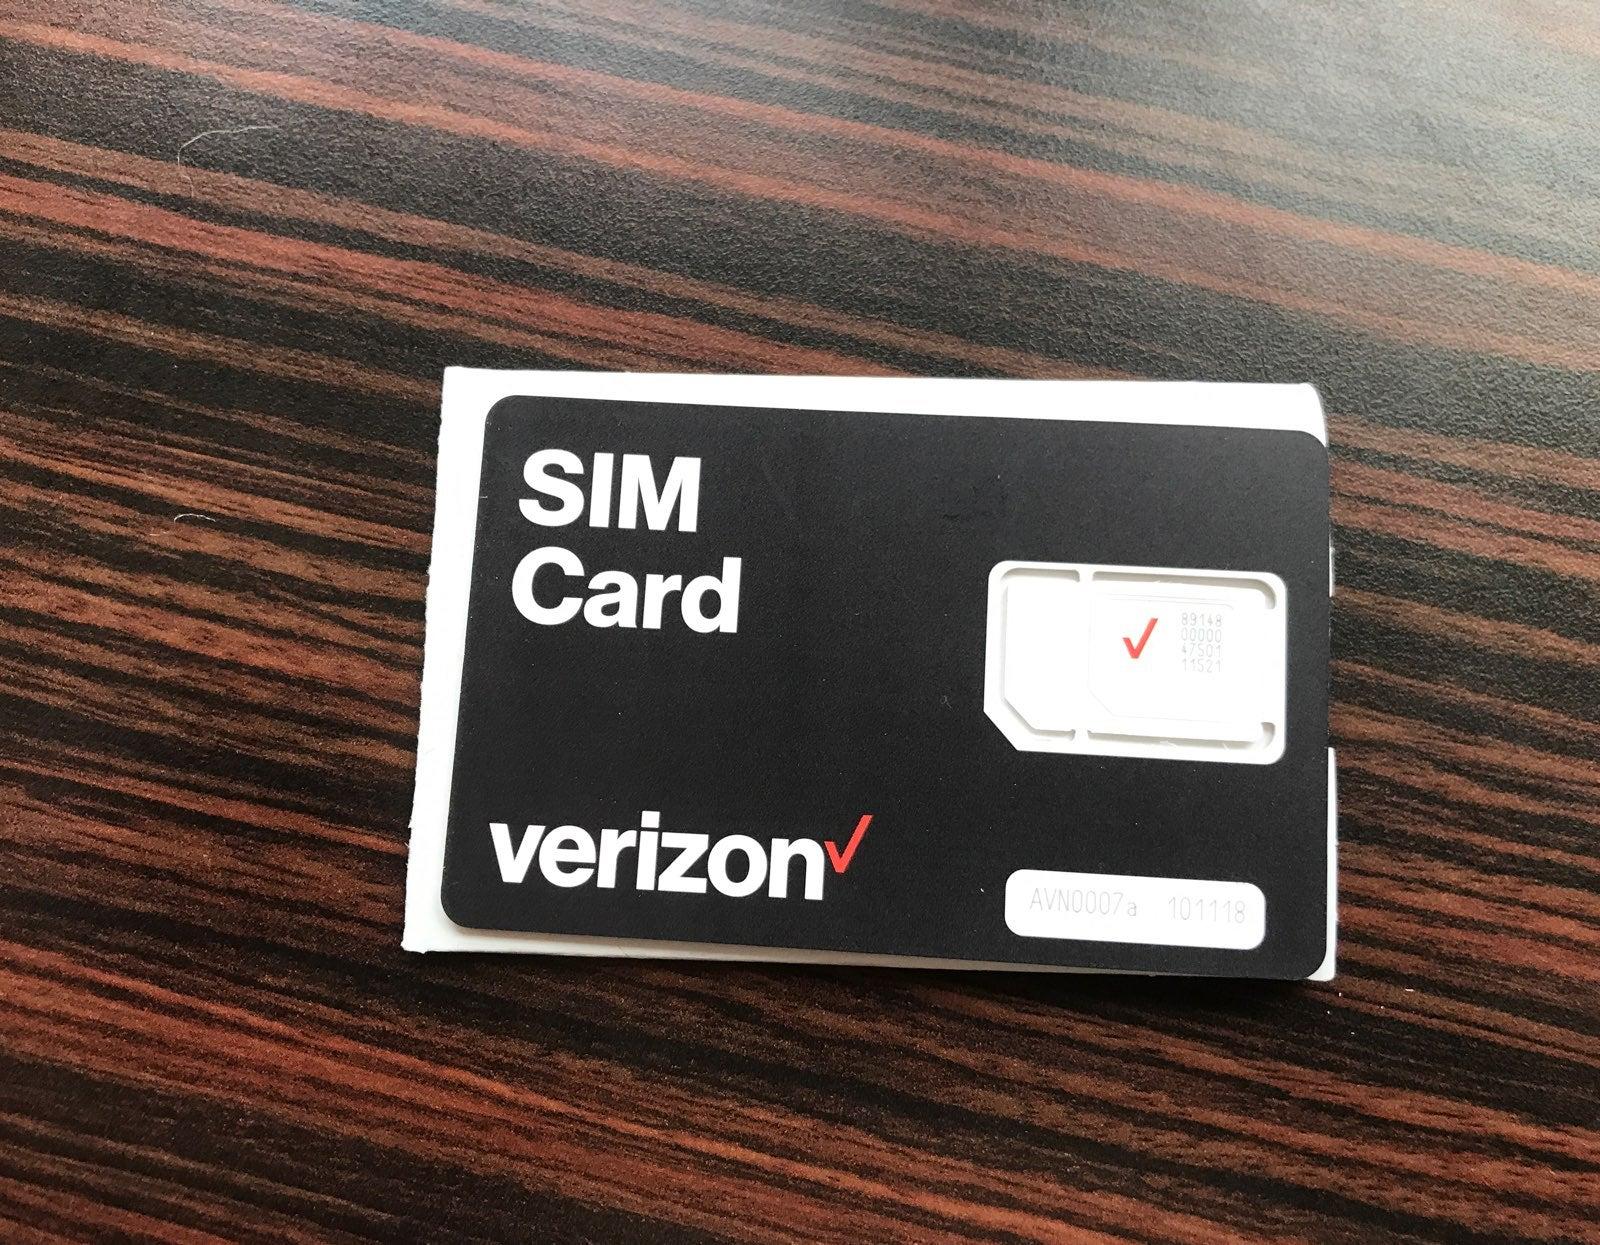 Verizon Iphone SIM card